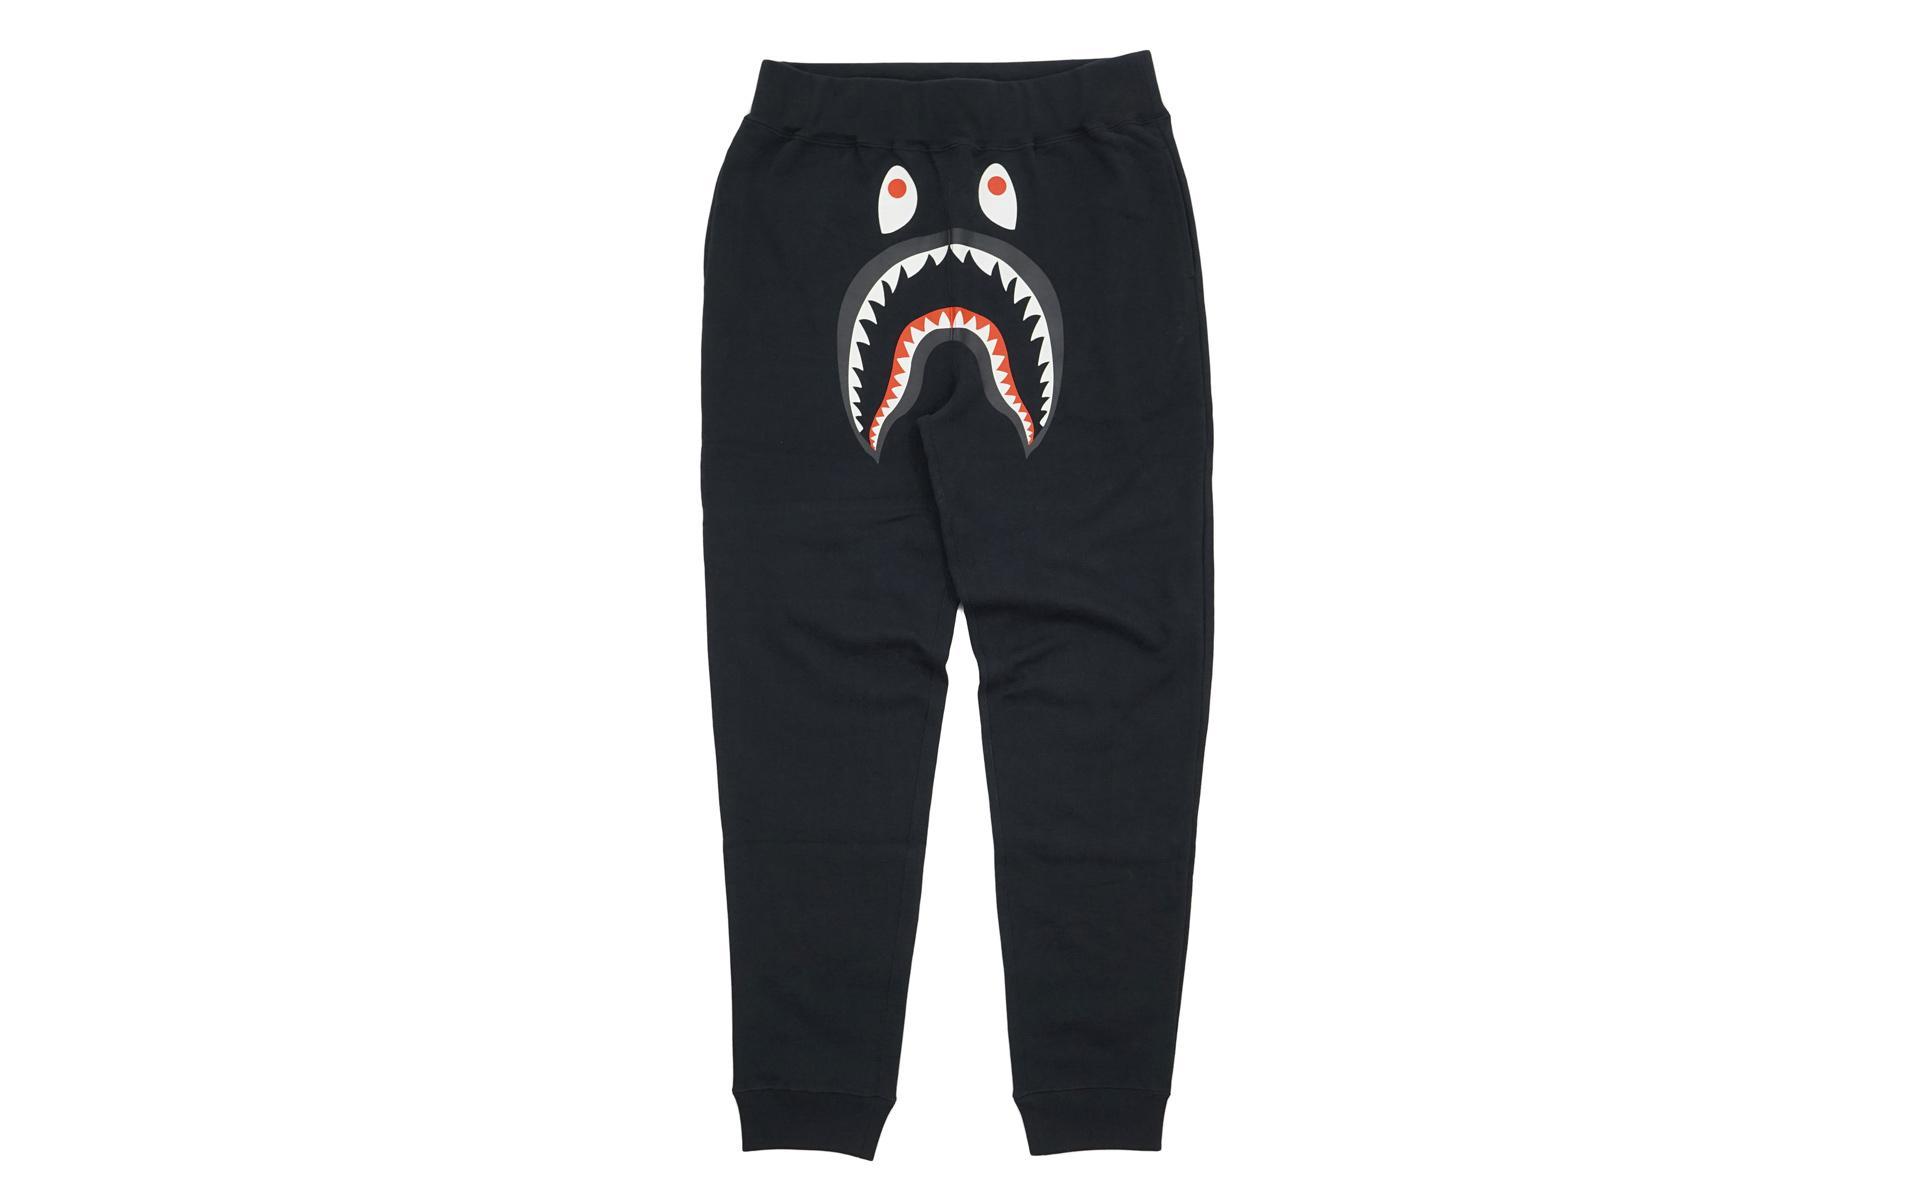 c65cf731 A Bathing Ape - Wgm Shark Slim Sweatpants Black for Men - Lyst. View  fullscreen